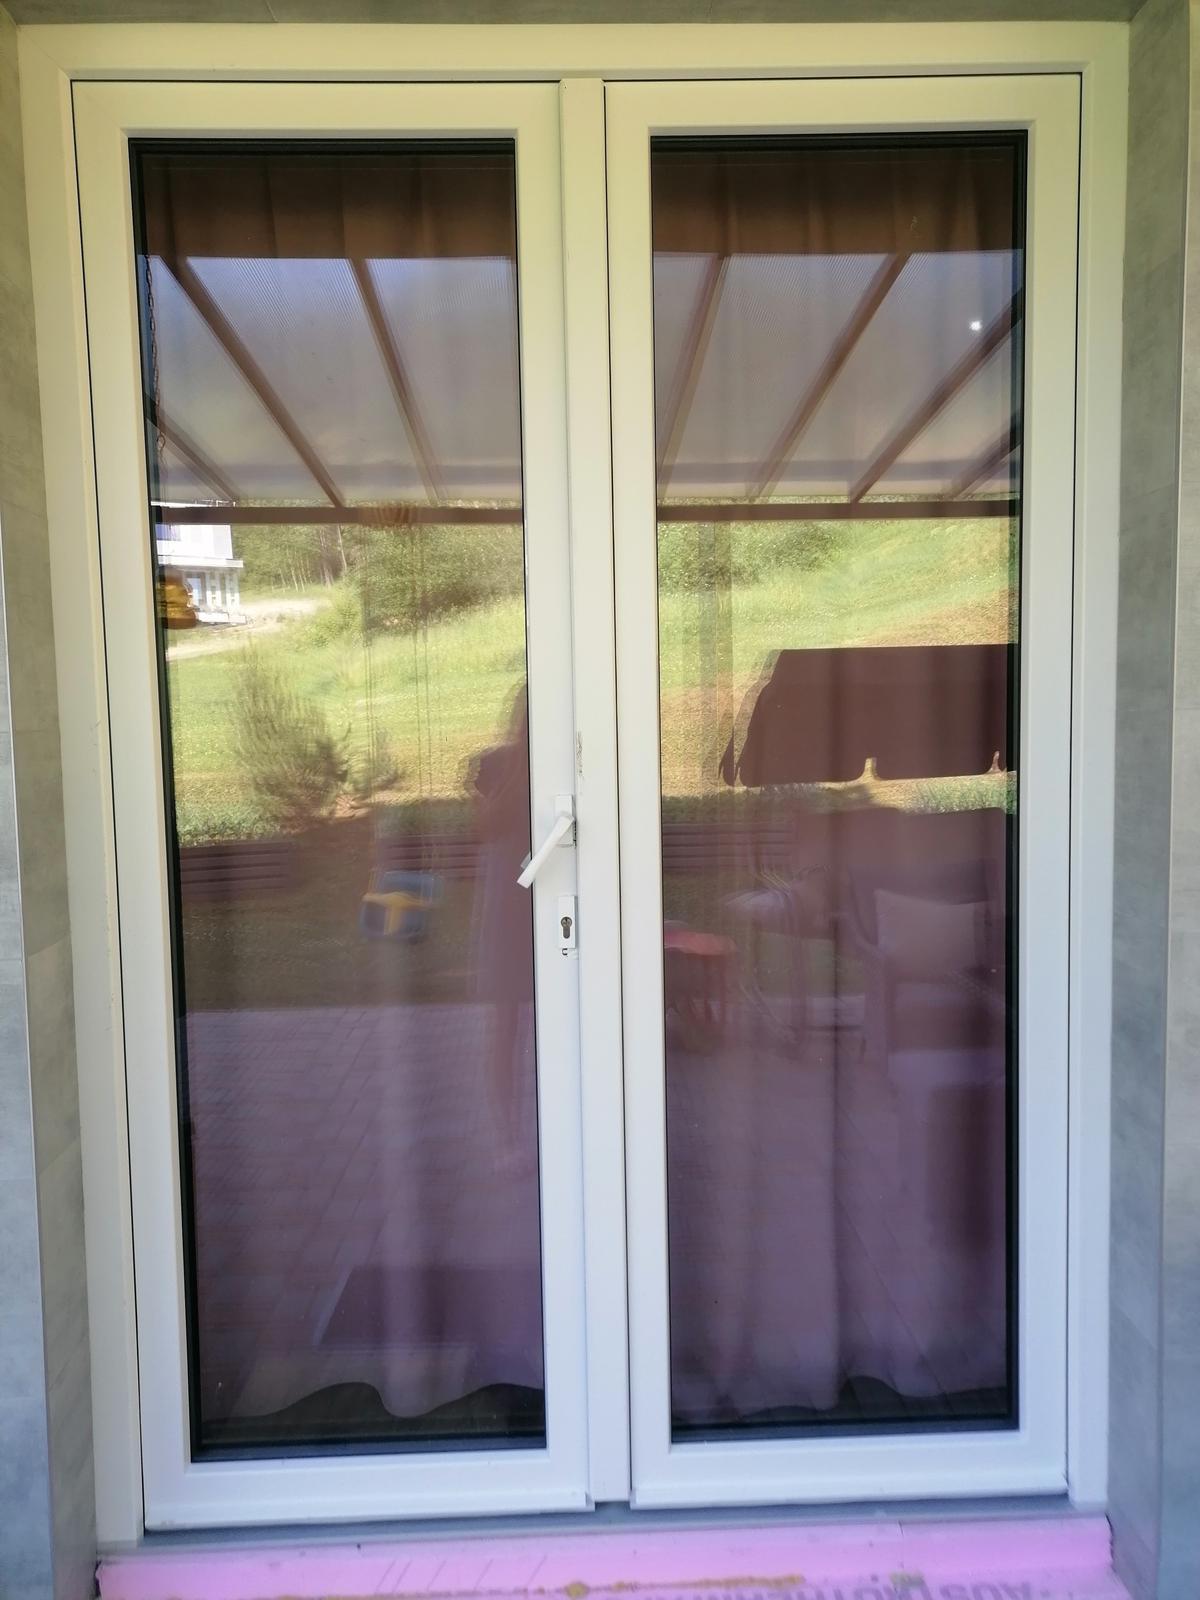 Dvojkrídlové balkónové dvere - Obrázok č. 1